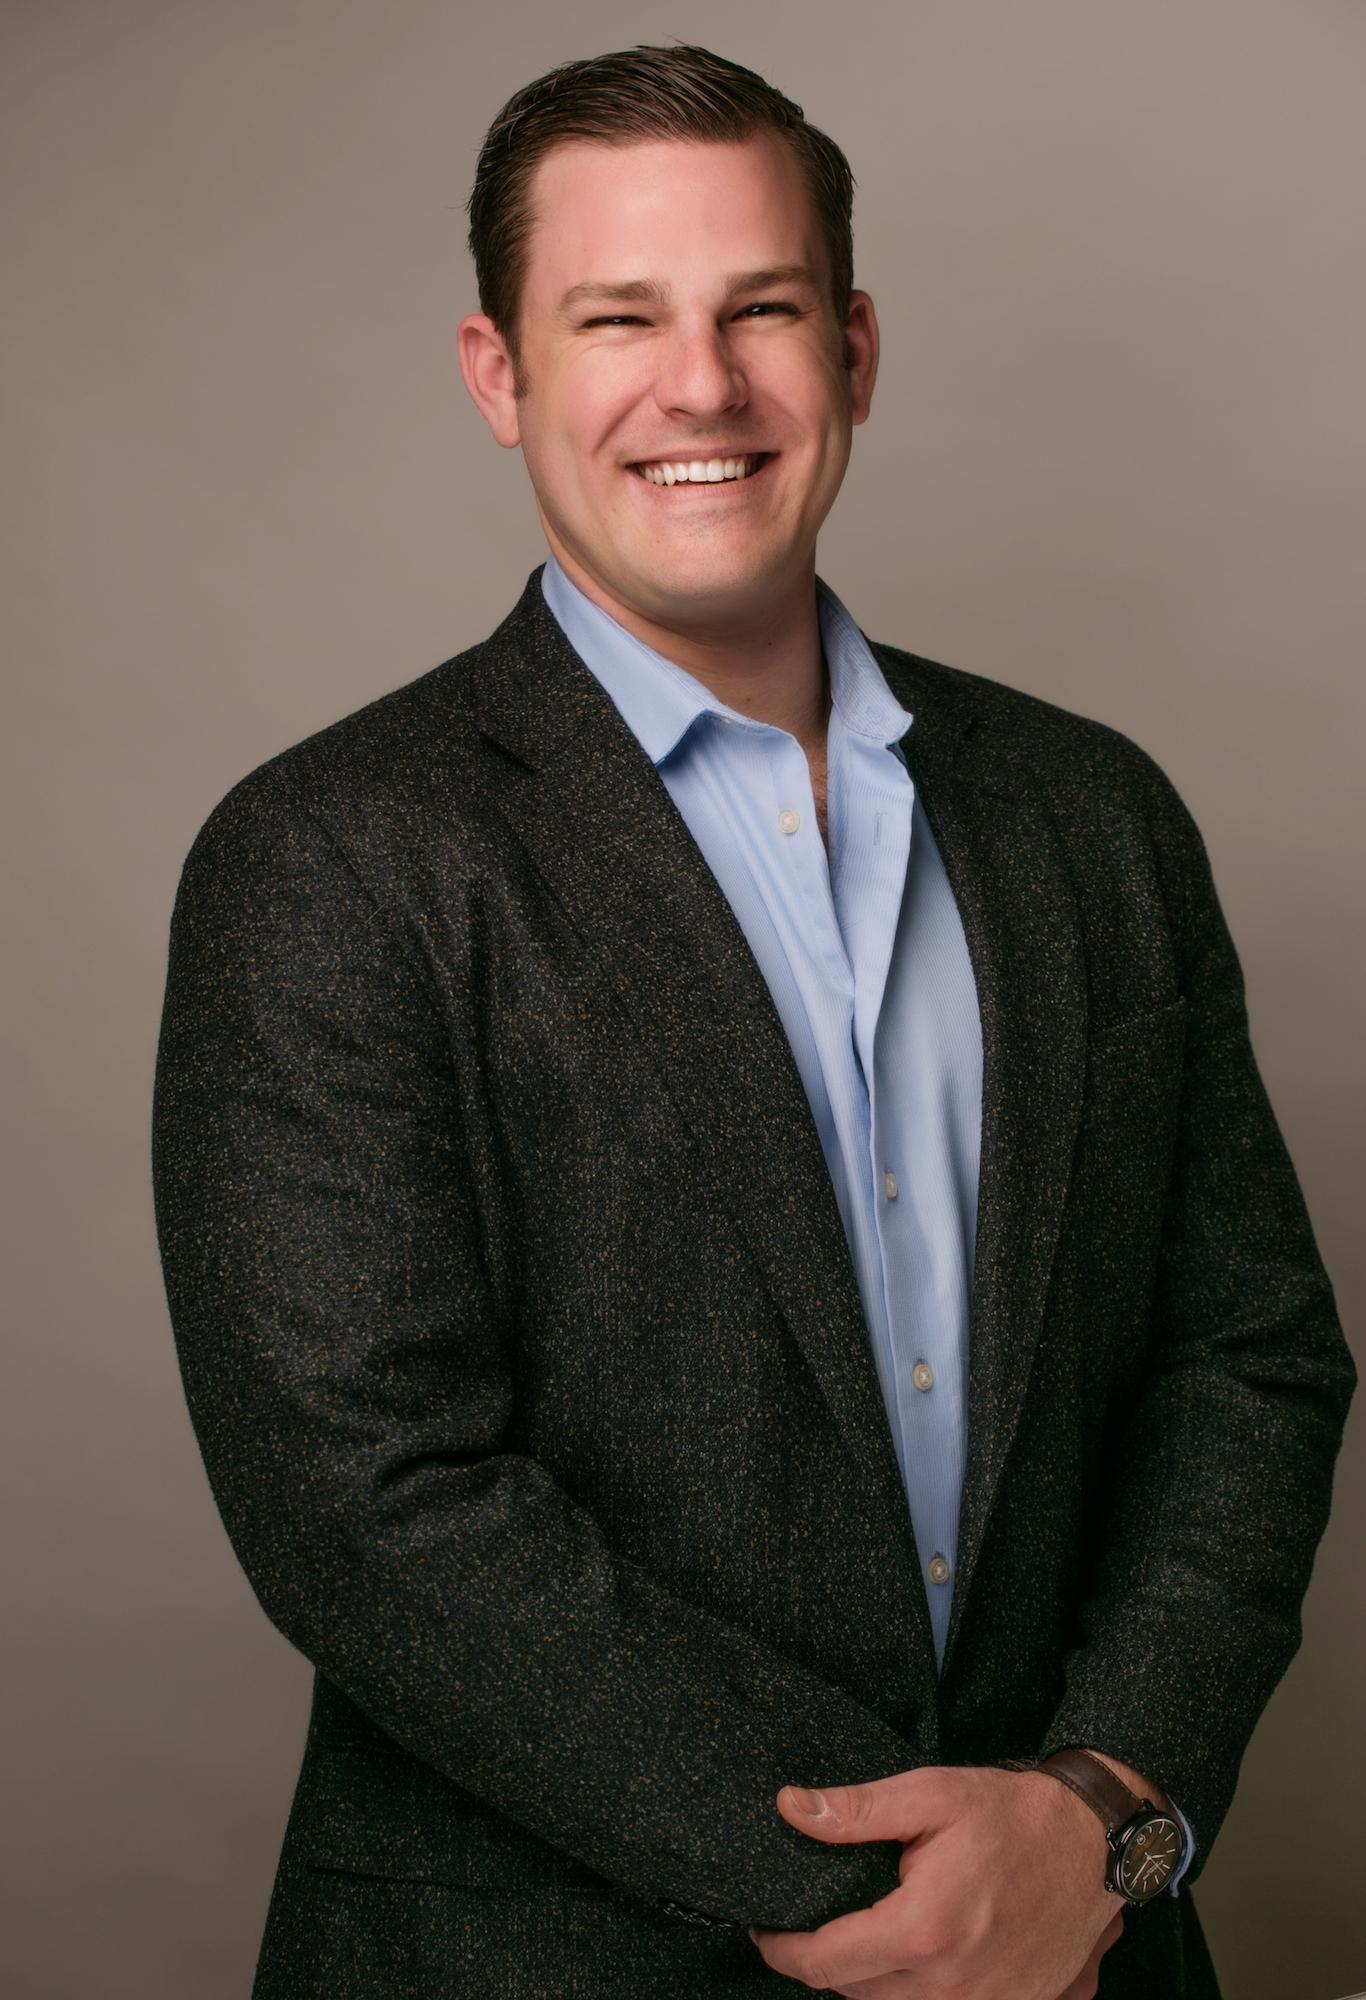 Trent Sanson